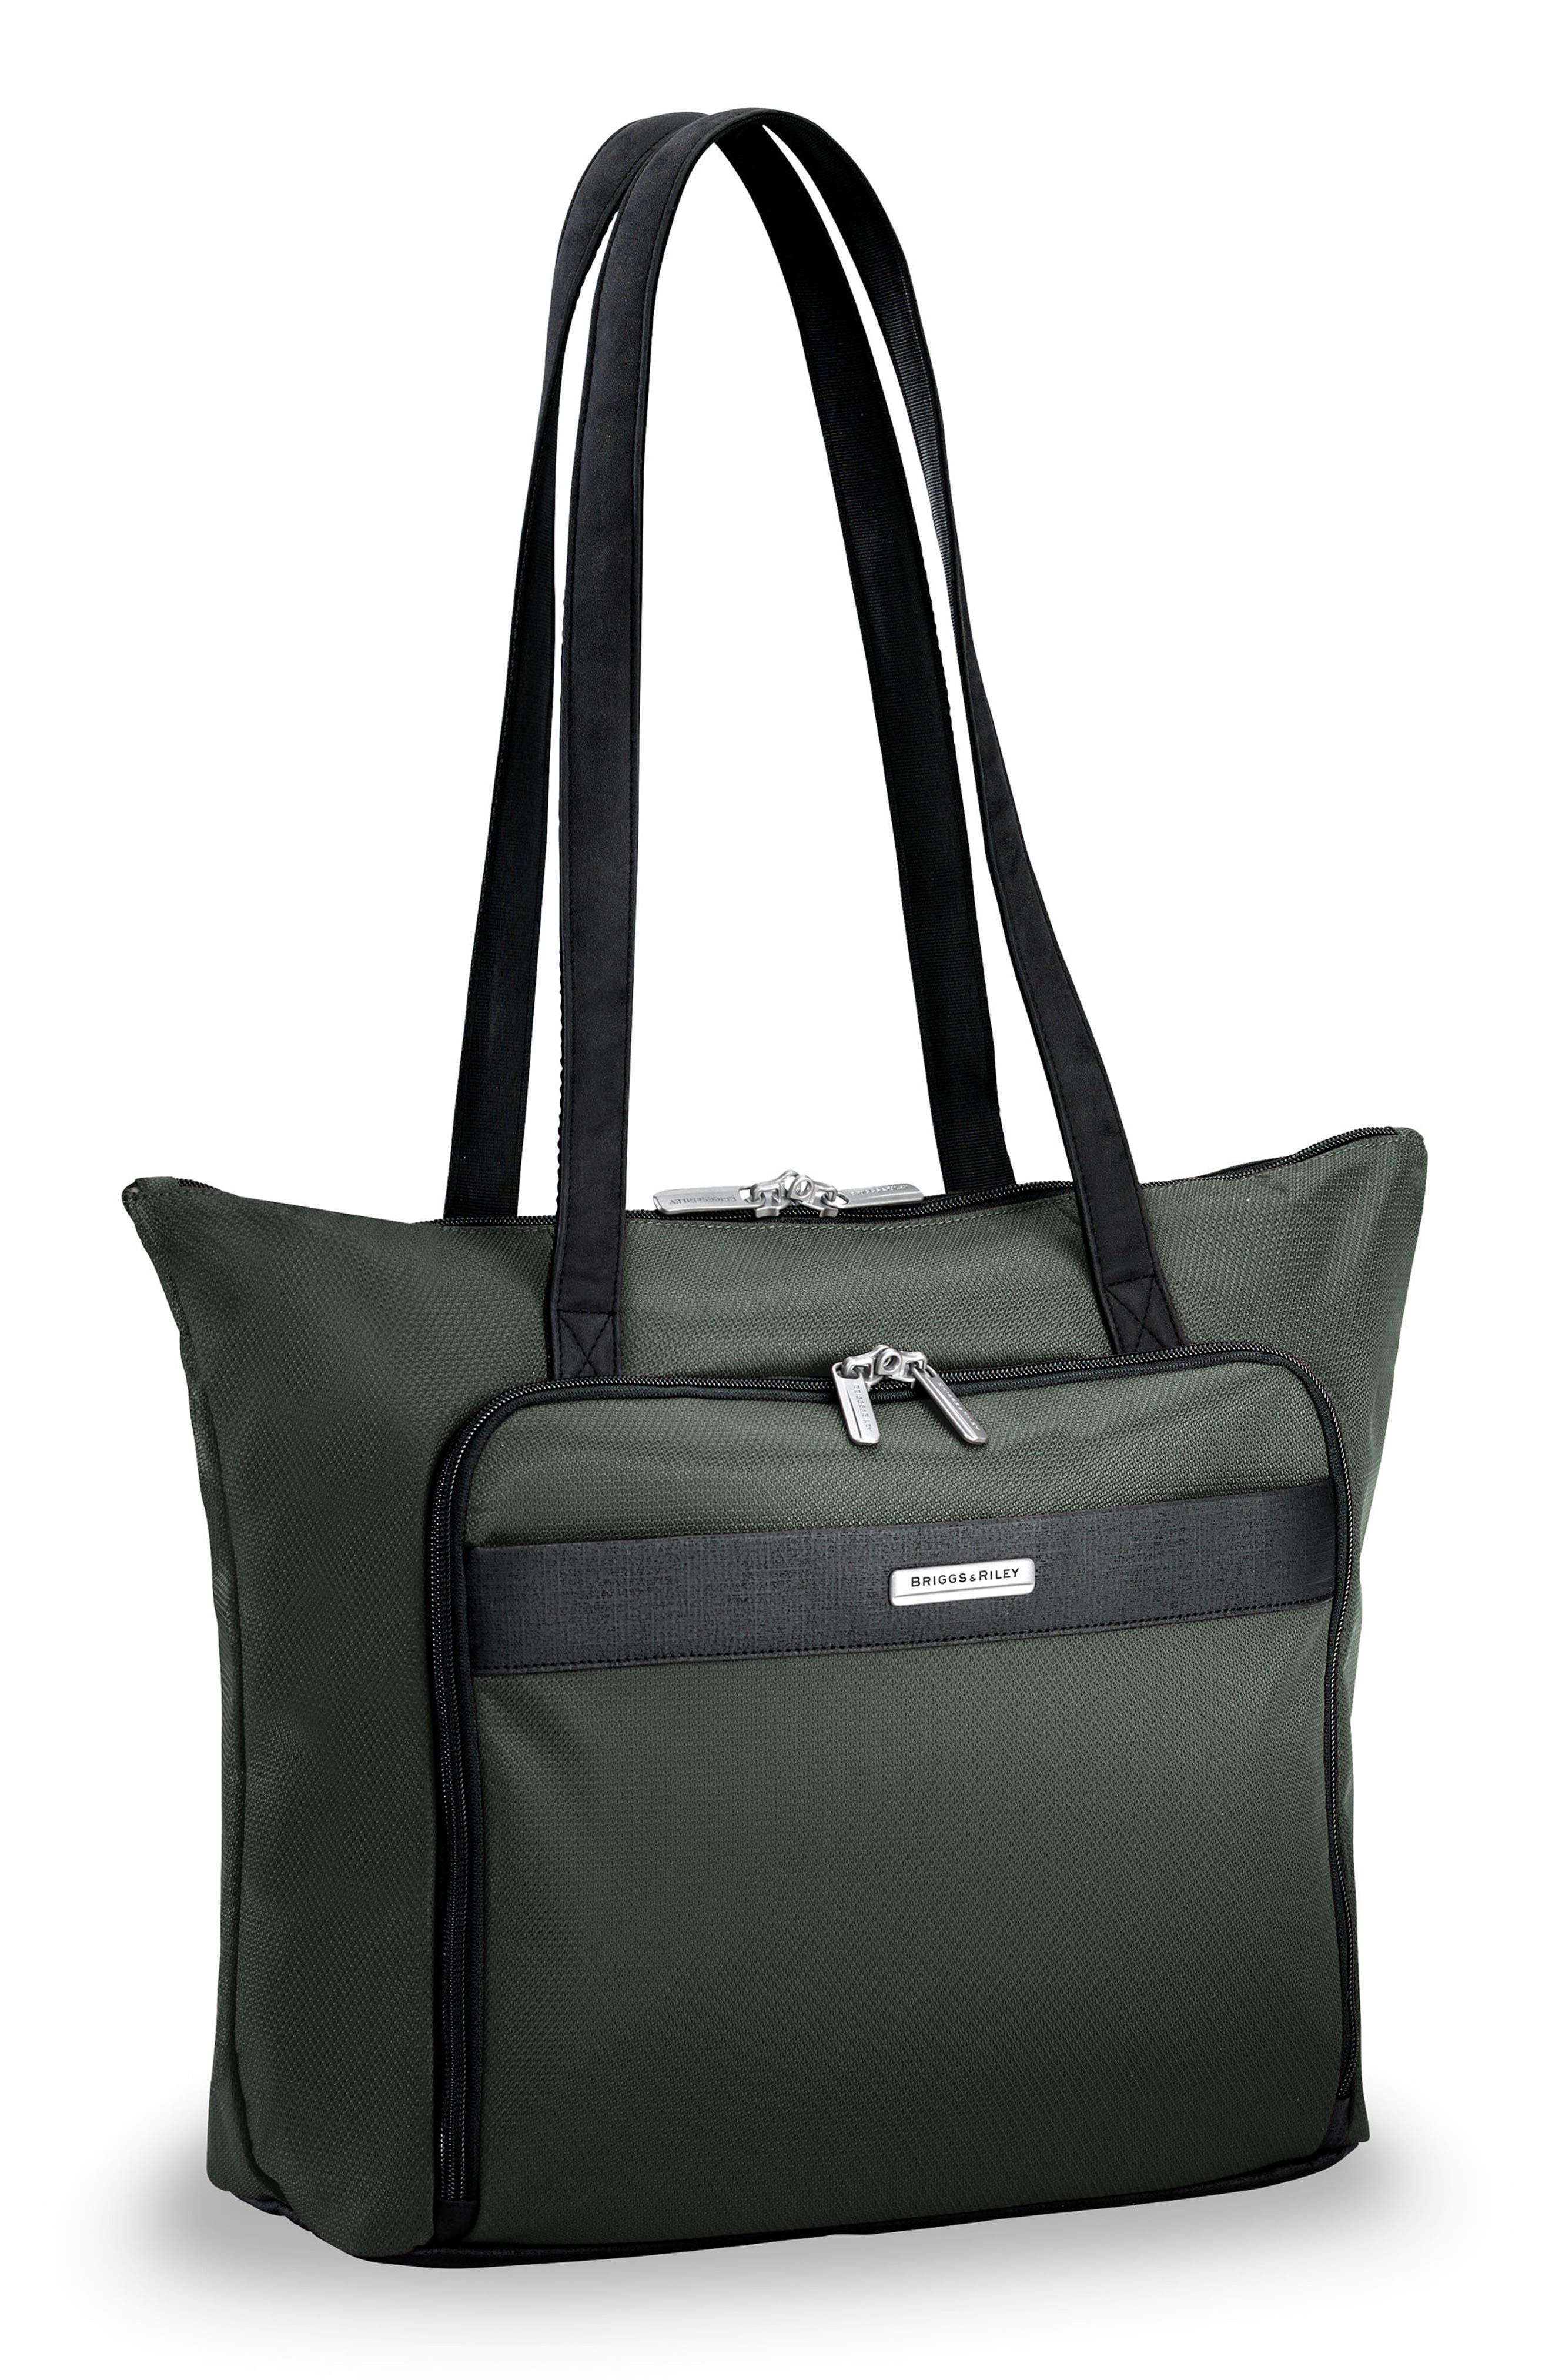 Transcend 400 Tote Bag,                             Alternate thumbnail 12, color,                             Rainforest Green